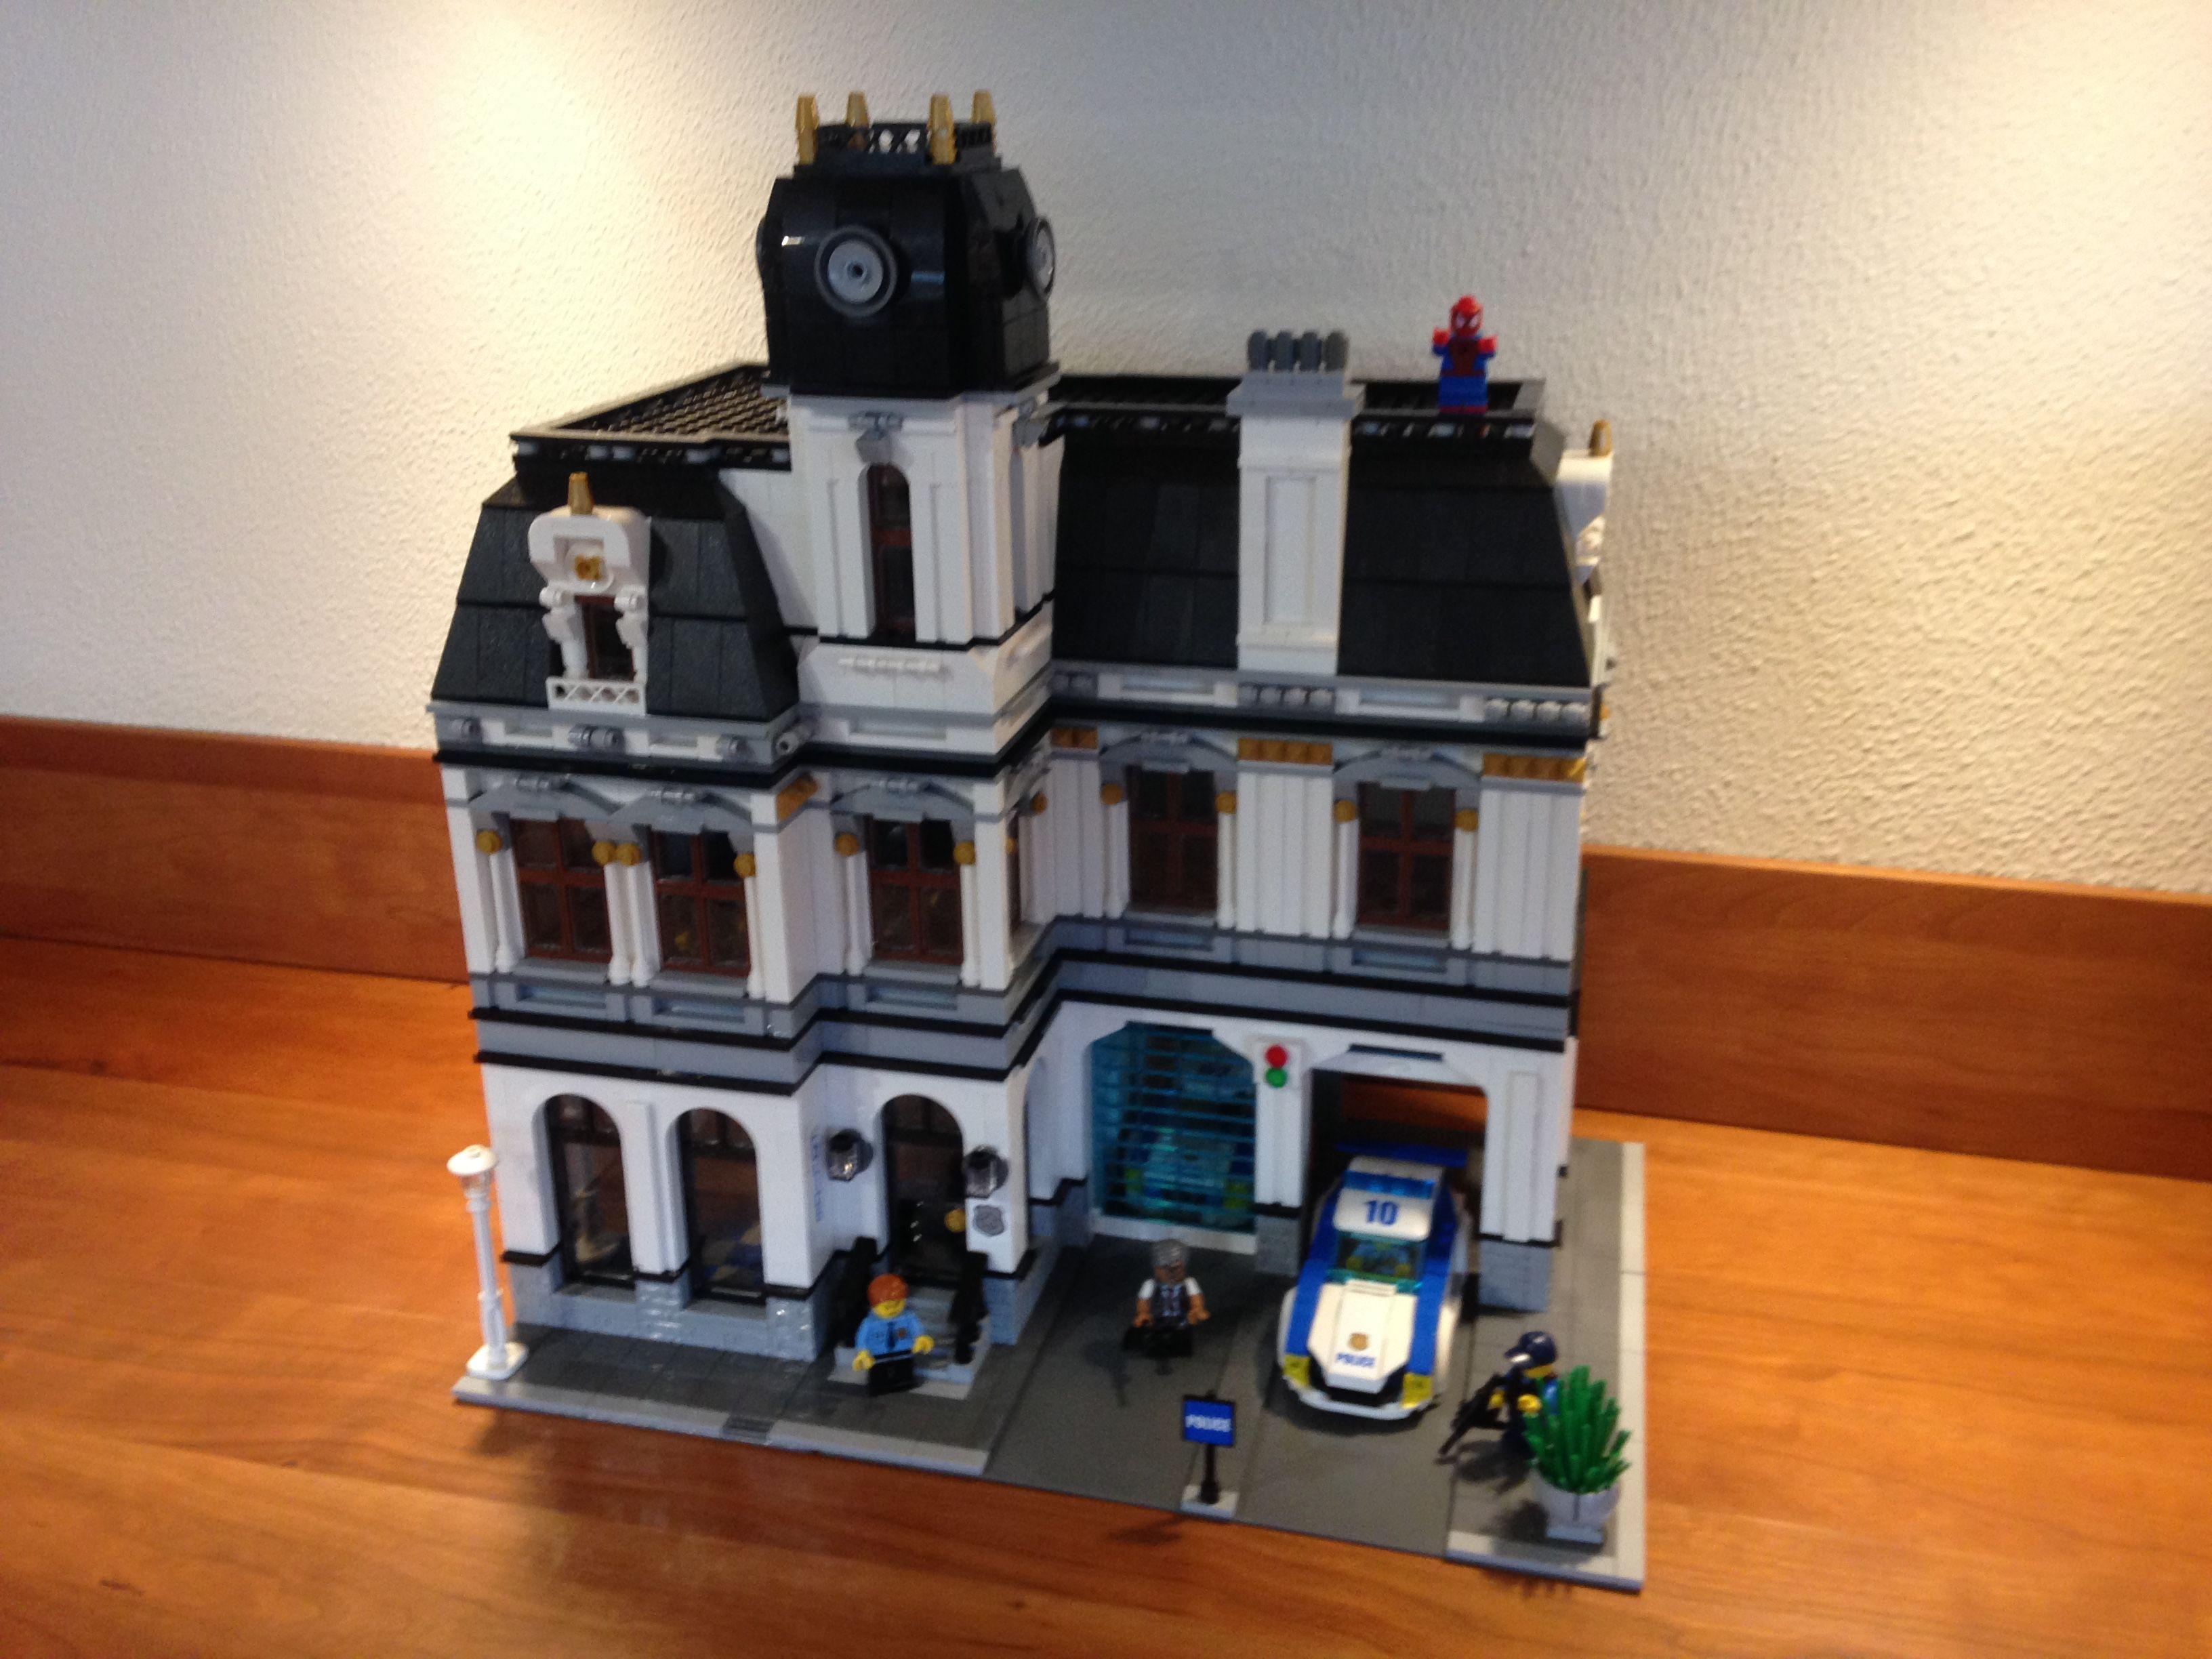 Lego Police Station Moc Modular I Pinterest Headquarters 7744 Creations Legos